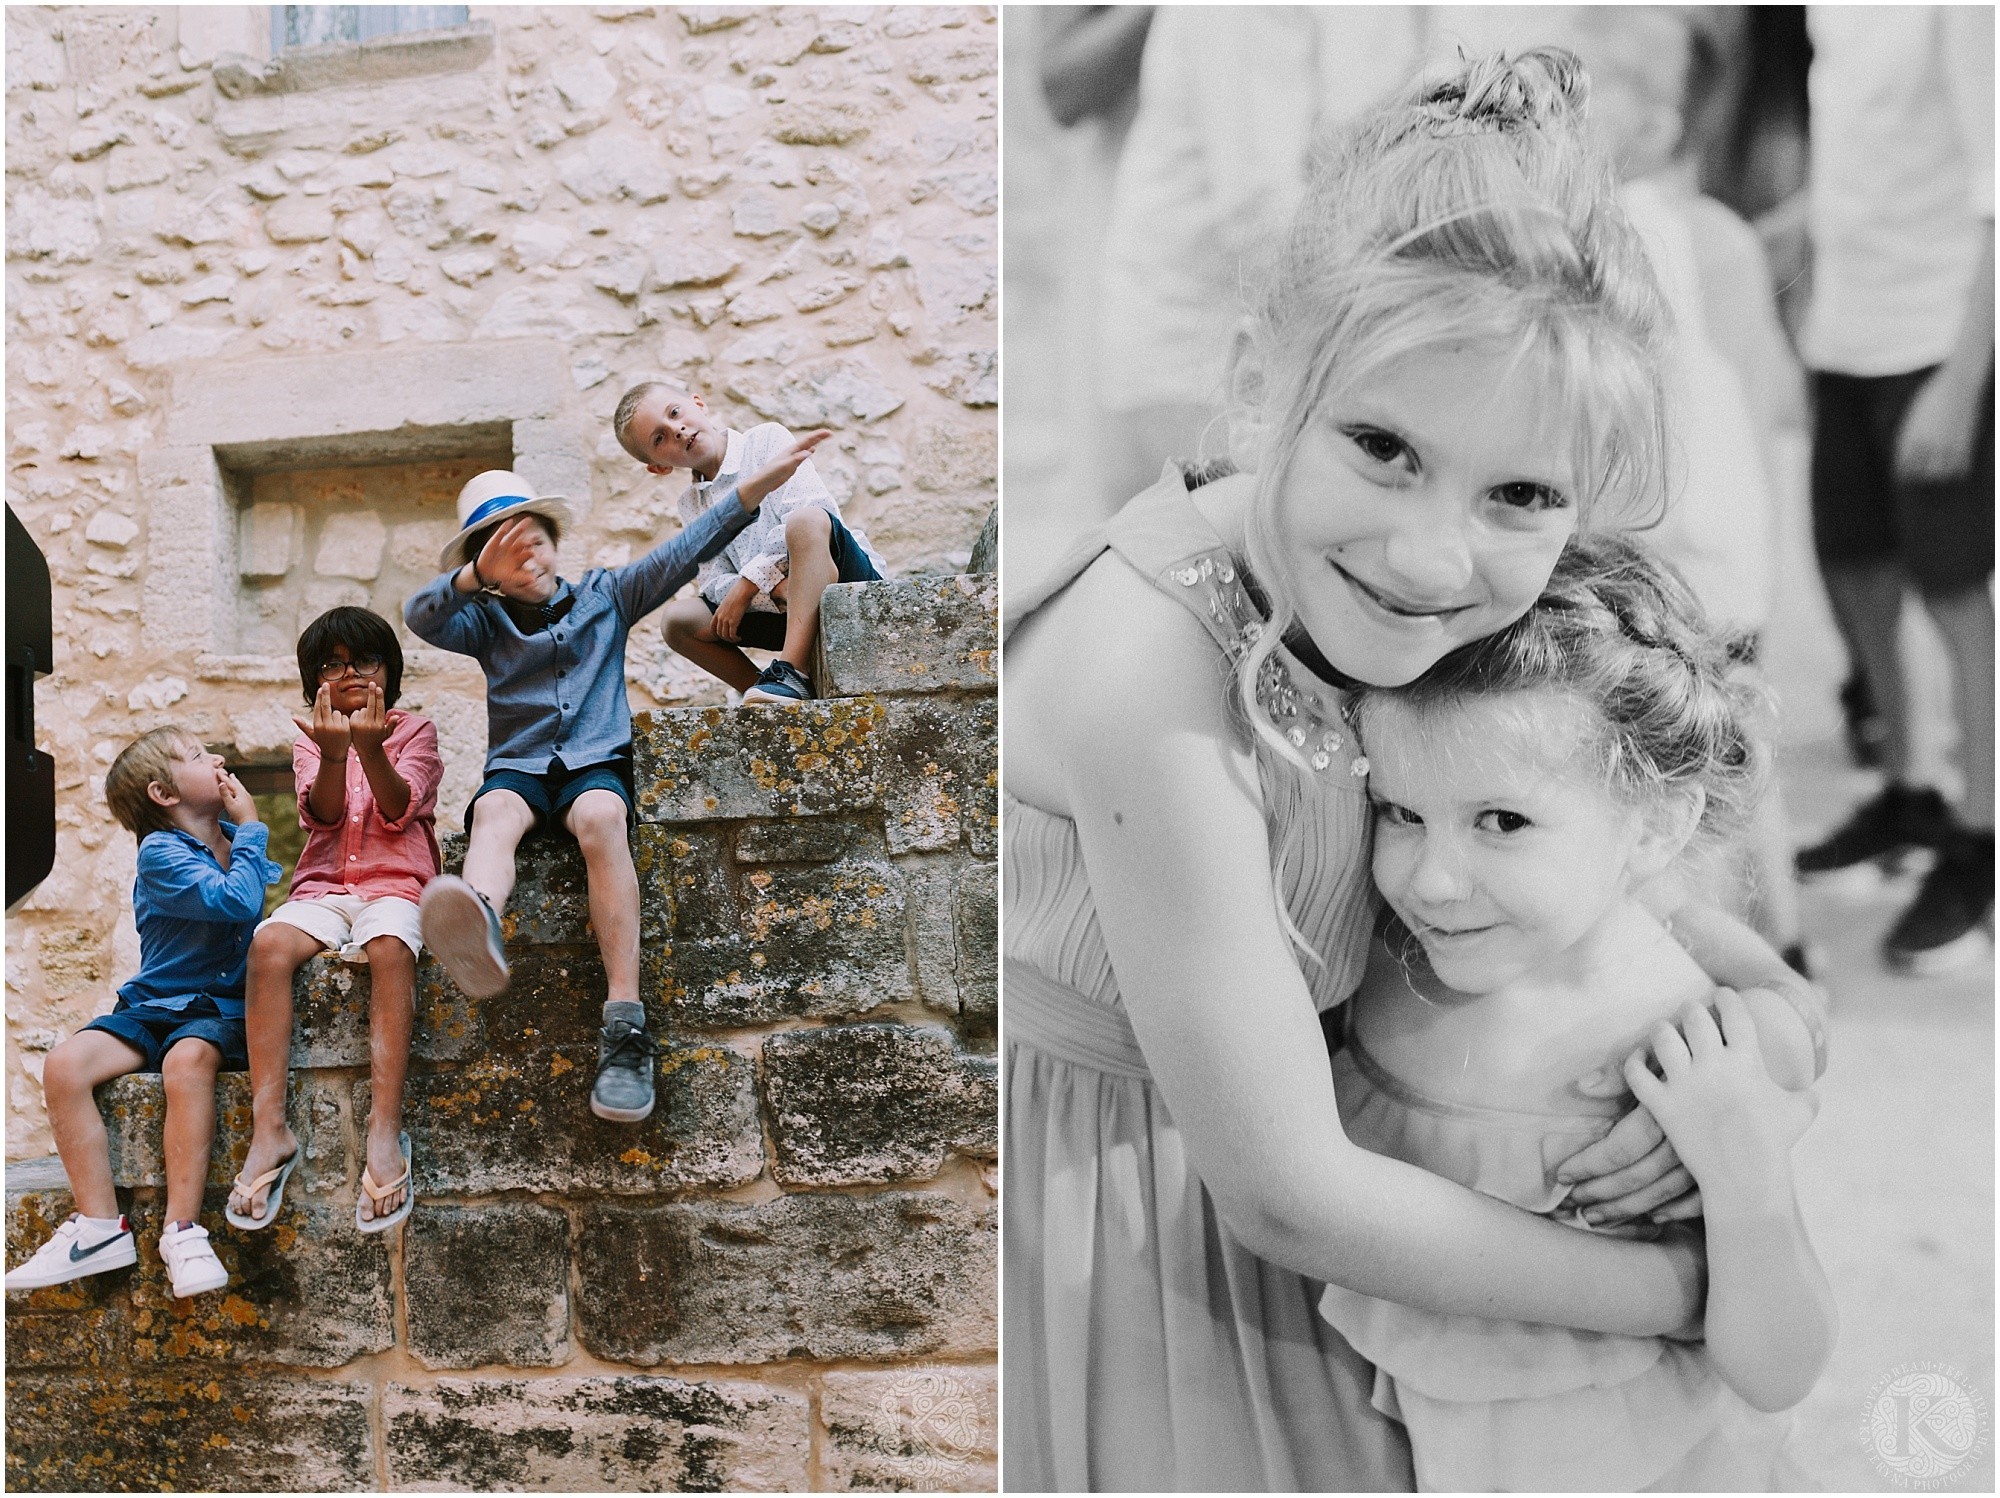 Kateryna-photos-photographe-mariage-vaucluse-provence-avignon-ferme-st-hugues_0089.jpg